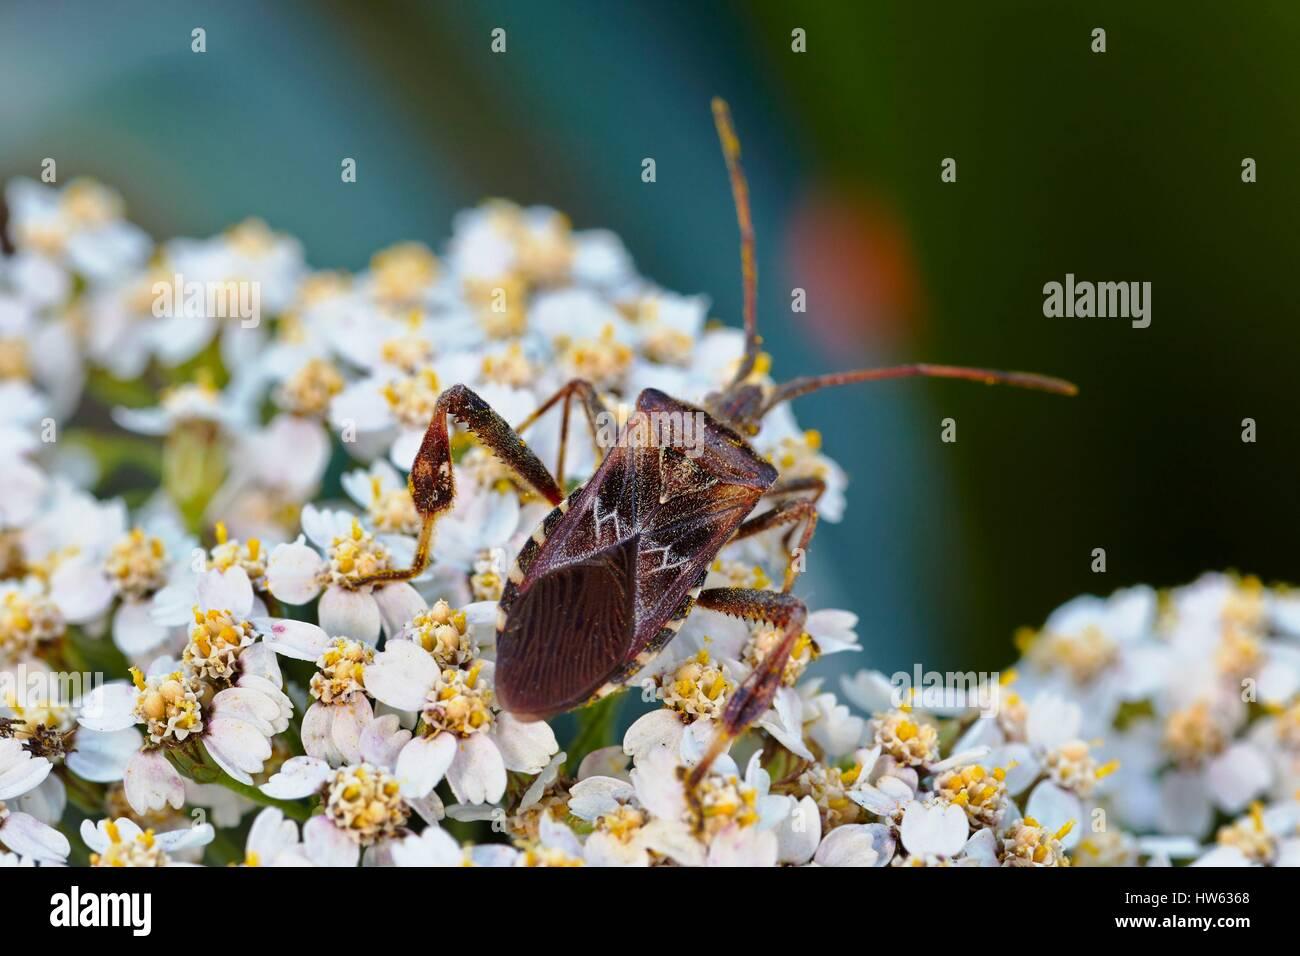 France, Morbihan, Hemiptera, Coreidae, Western conifer seed bug or Leaf-footed bug (Leptoglossus occidentalis) - Stock Image